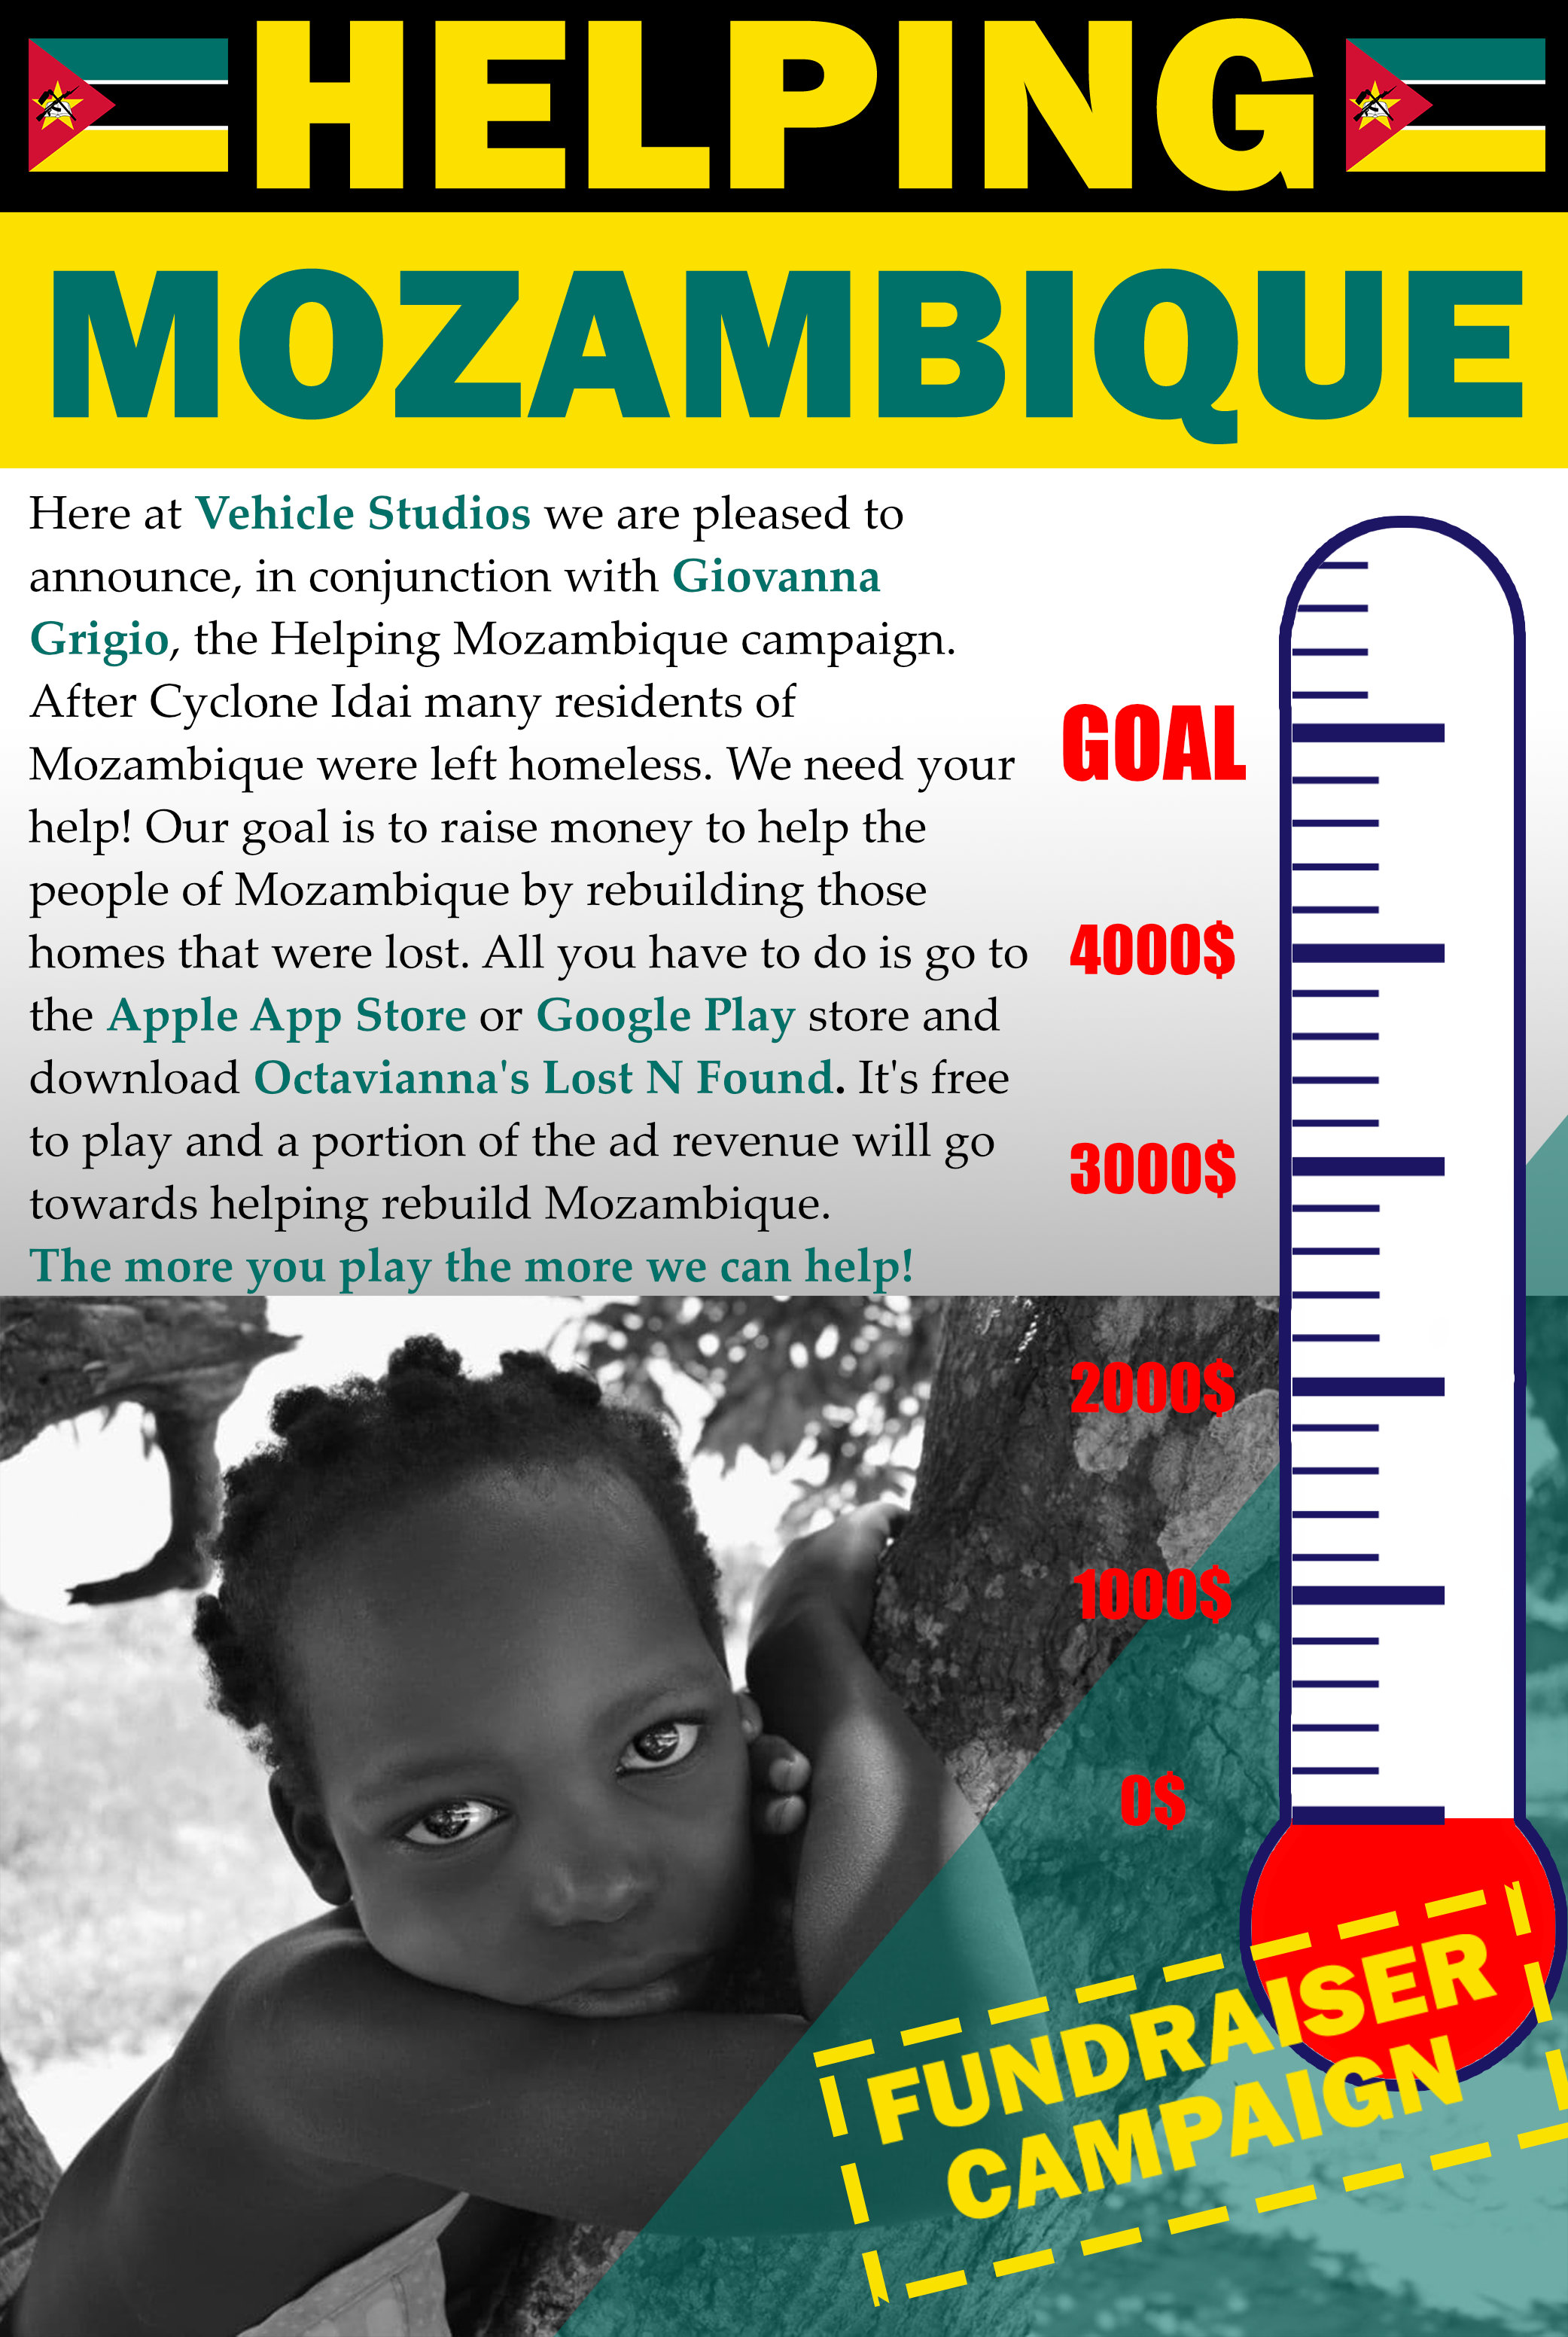 Helping Mozambique_ENG.jpg